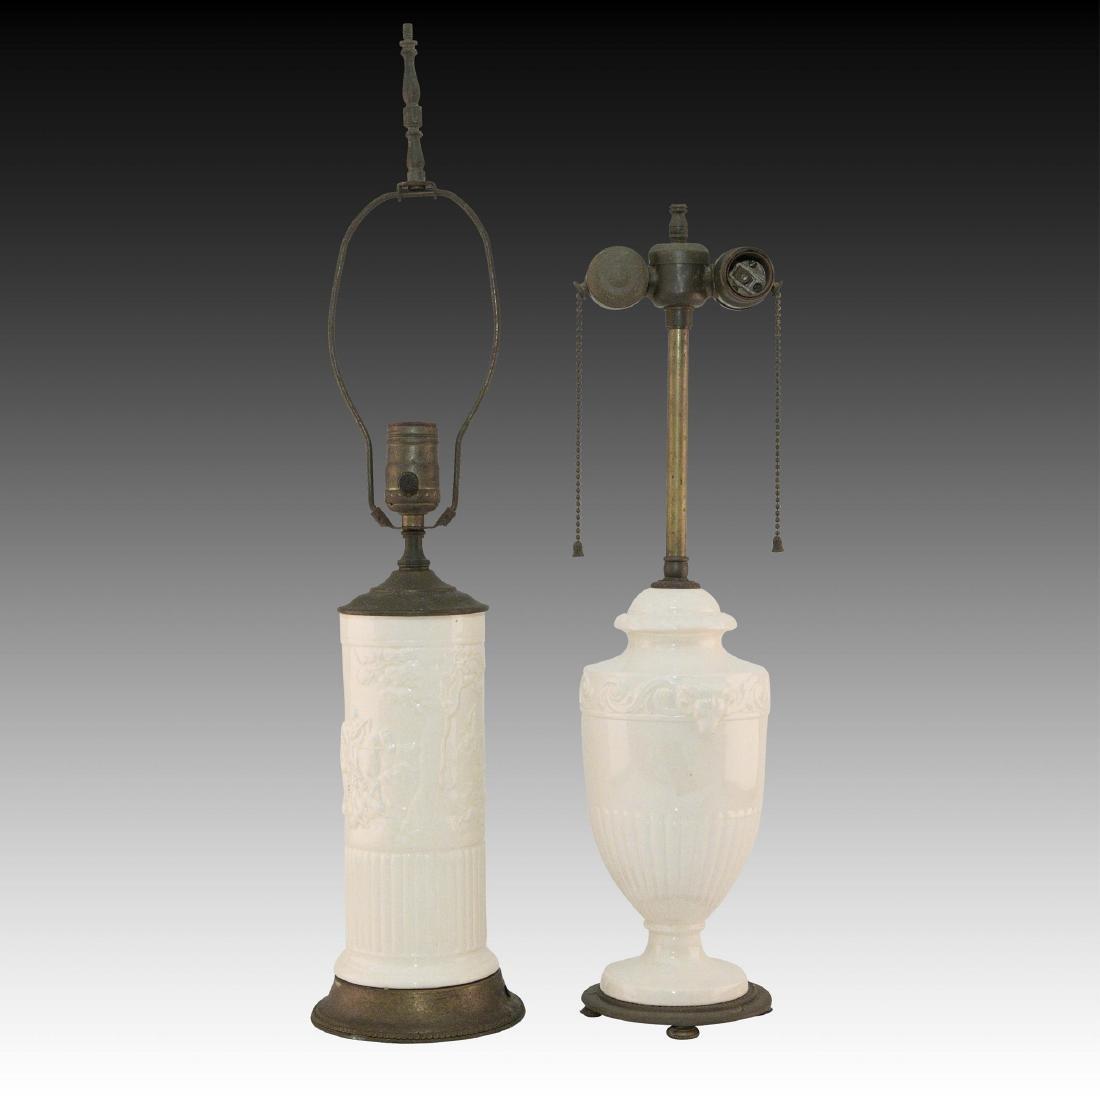 2 Wedgwood Queensware Lamps